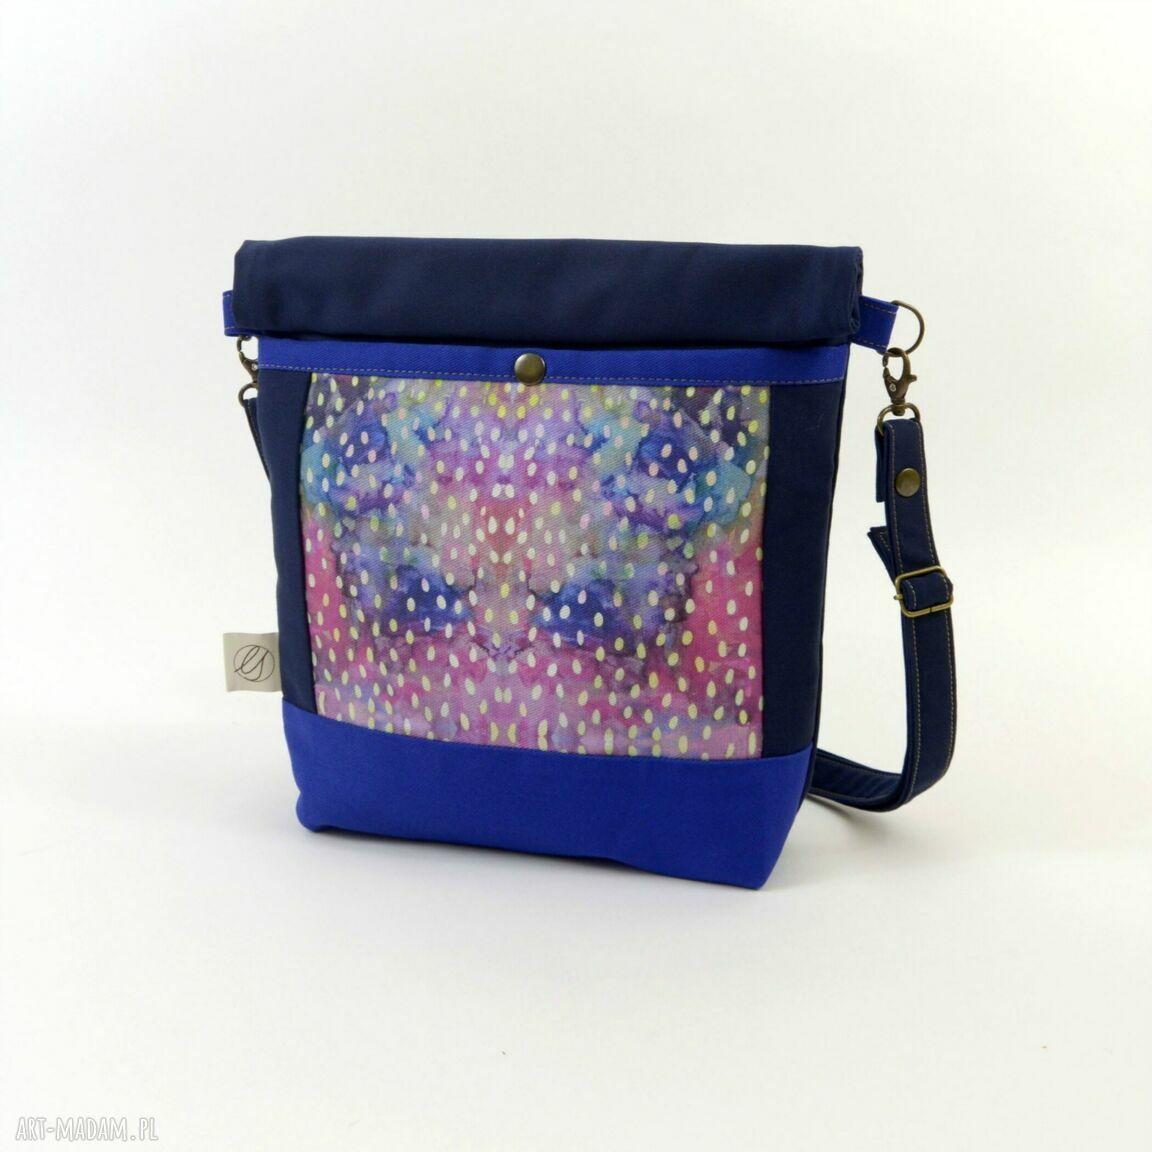 hand-made święta upominki torebka na ramię minibag no. 2